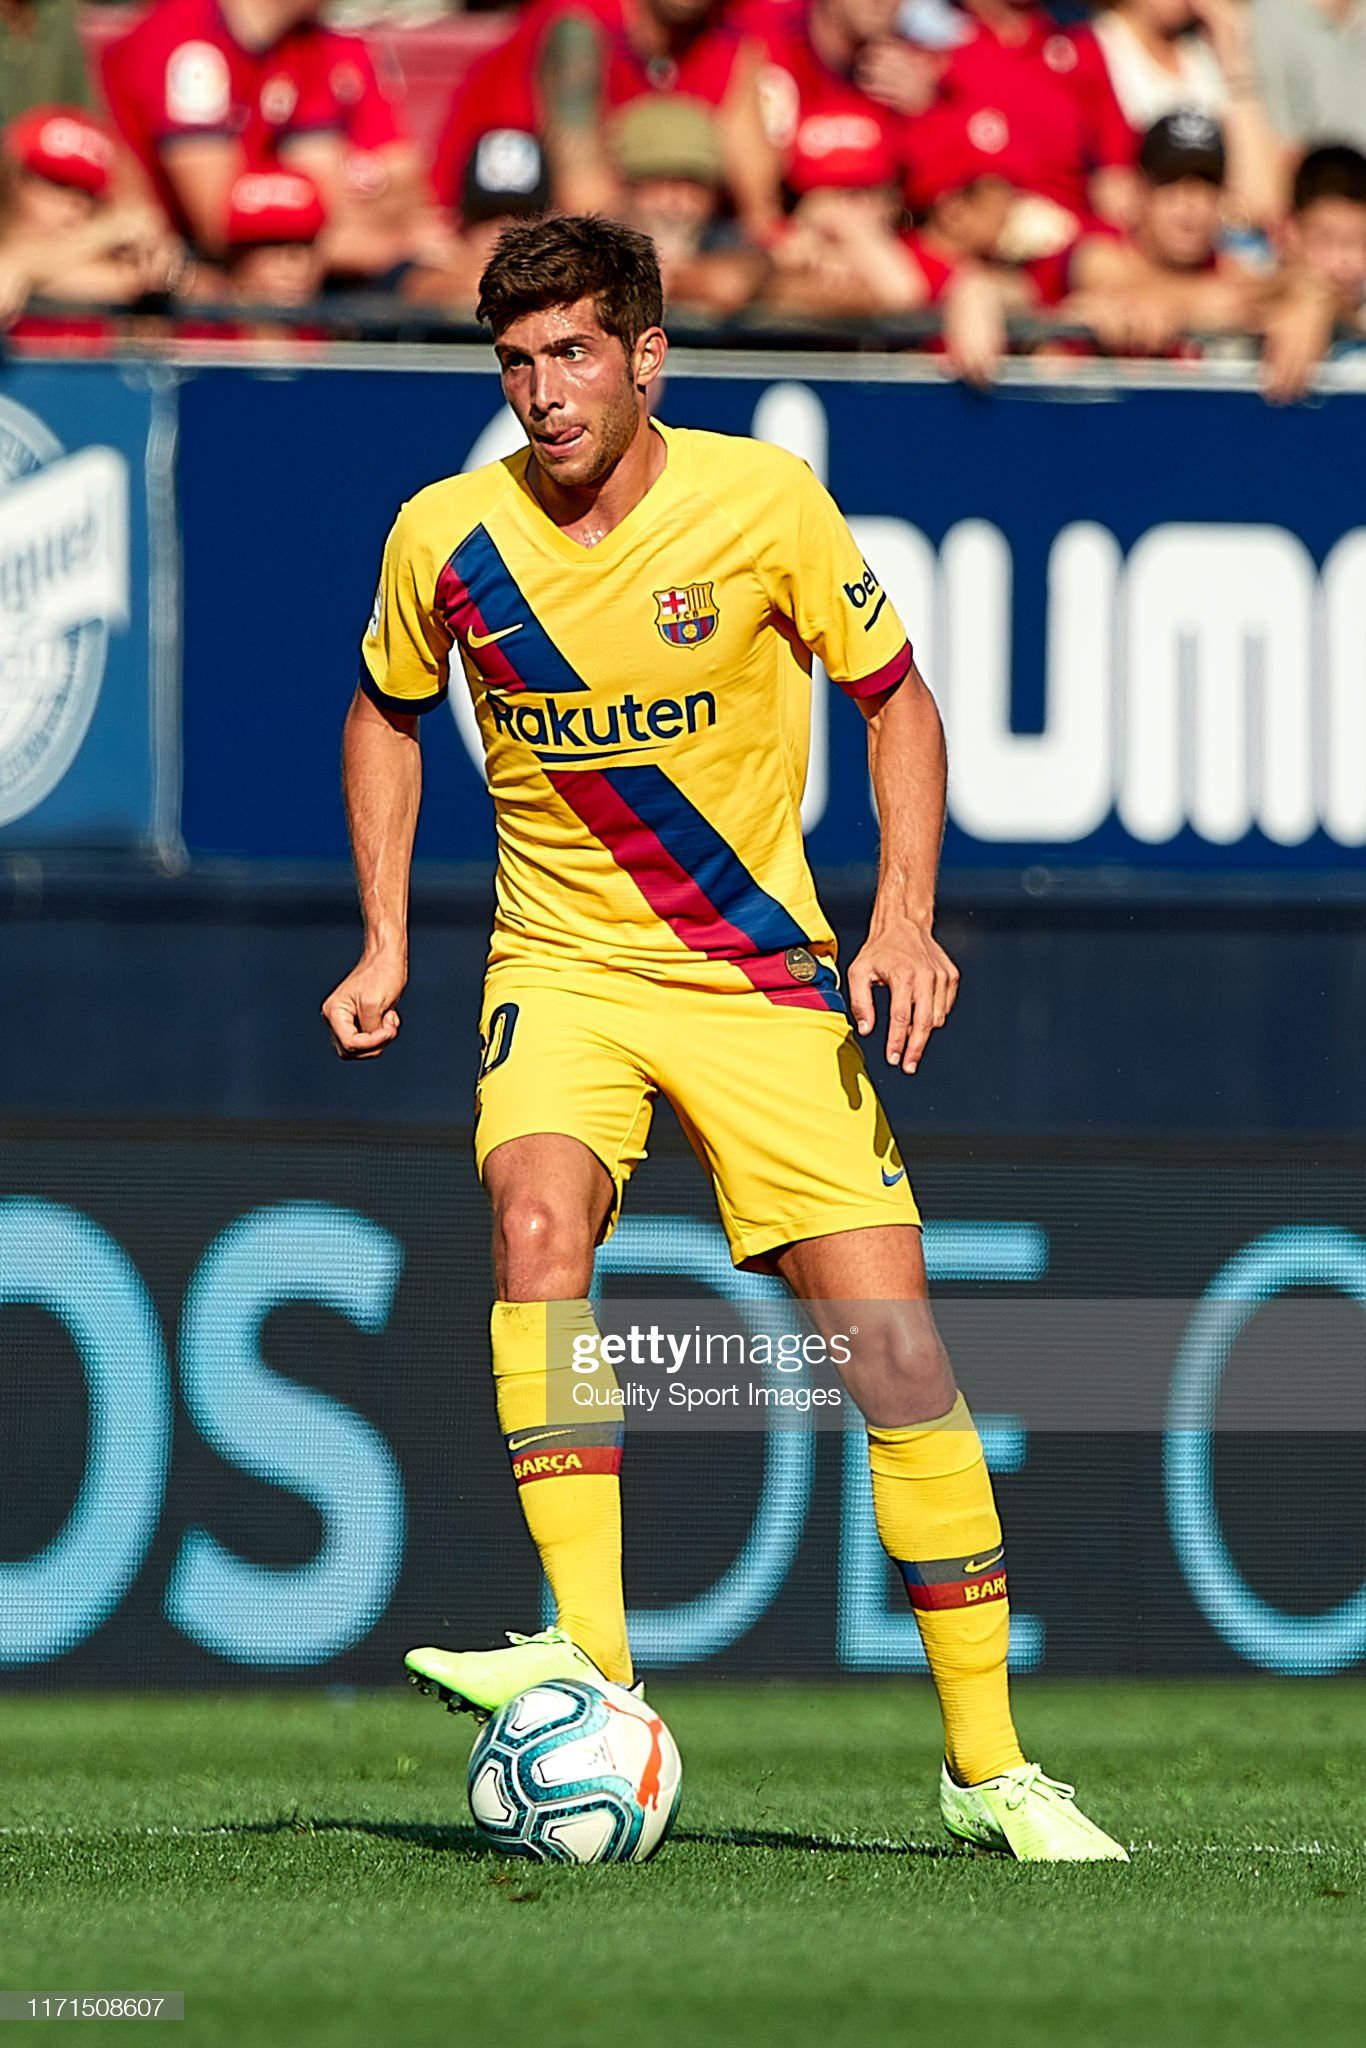 صور مباراة : أوساسونا - برشلونة 2-2 ( 31-08-2019 )  Sergi-roberto-of-fc-barcelona-with-the-ball-during-the-liga-match-ca-picture-id1171508607?s=2048x2048